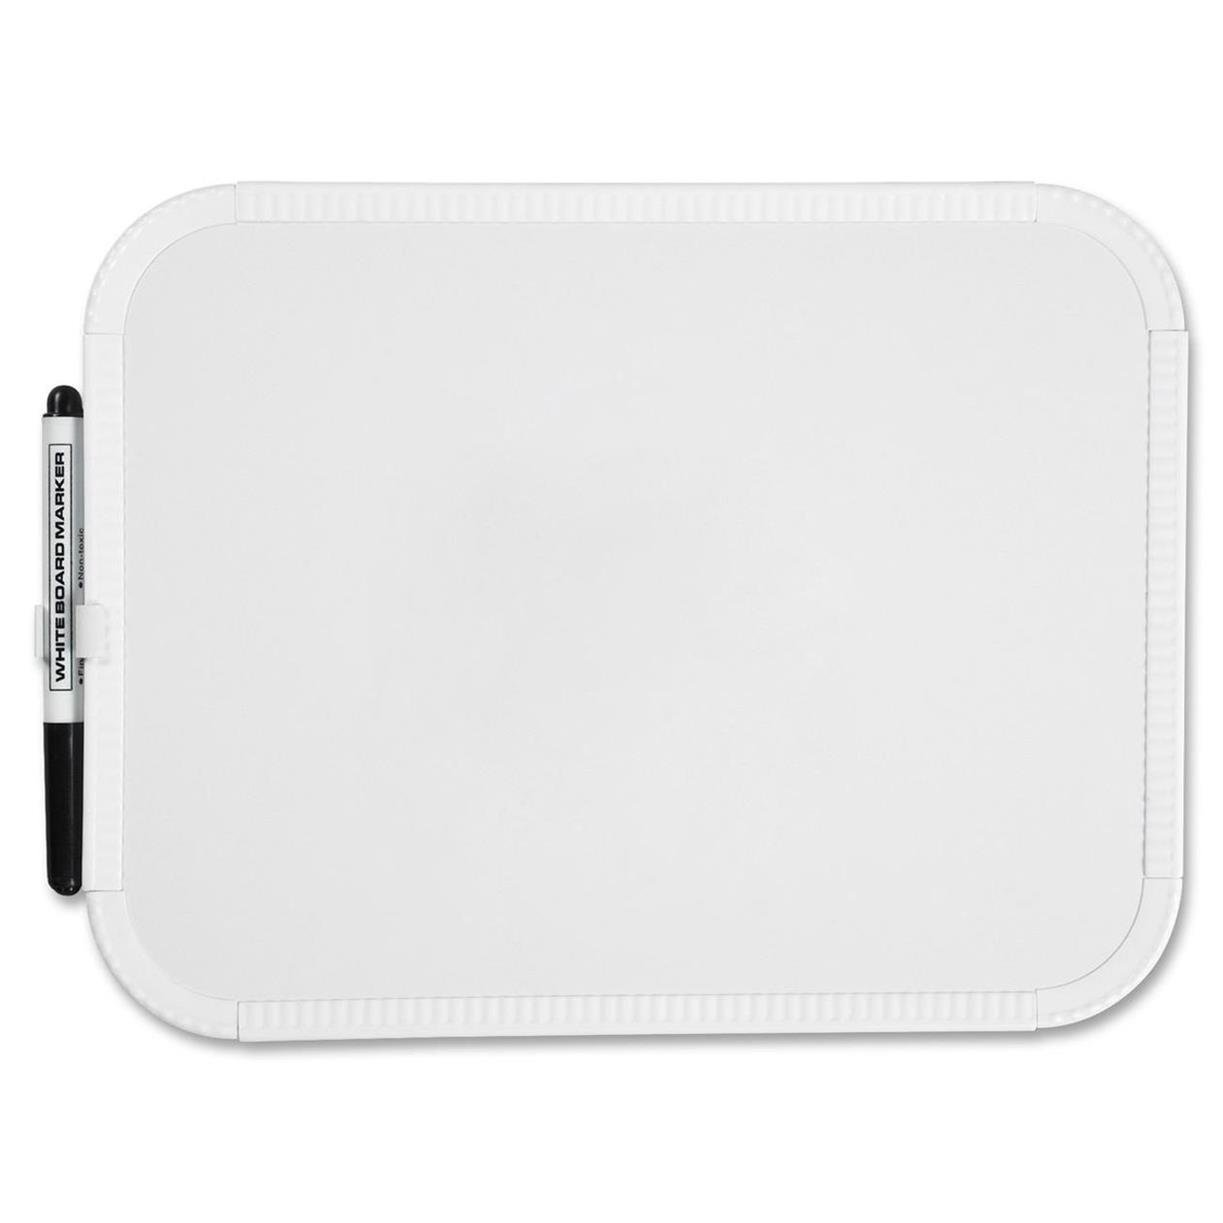 51XBRNLIQbL. SL1223  - Sparco Marker Board, Melamine Surface, 8-1/2 x 11 Inches, White (SPR75620)